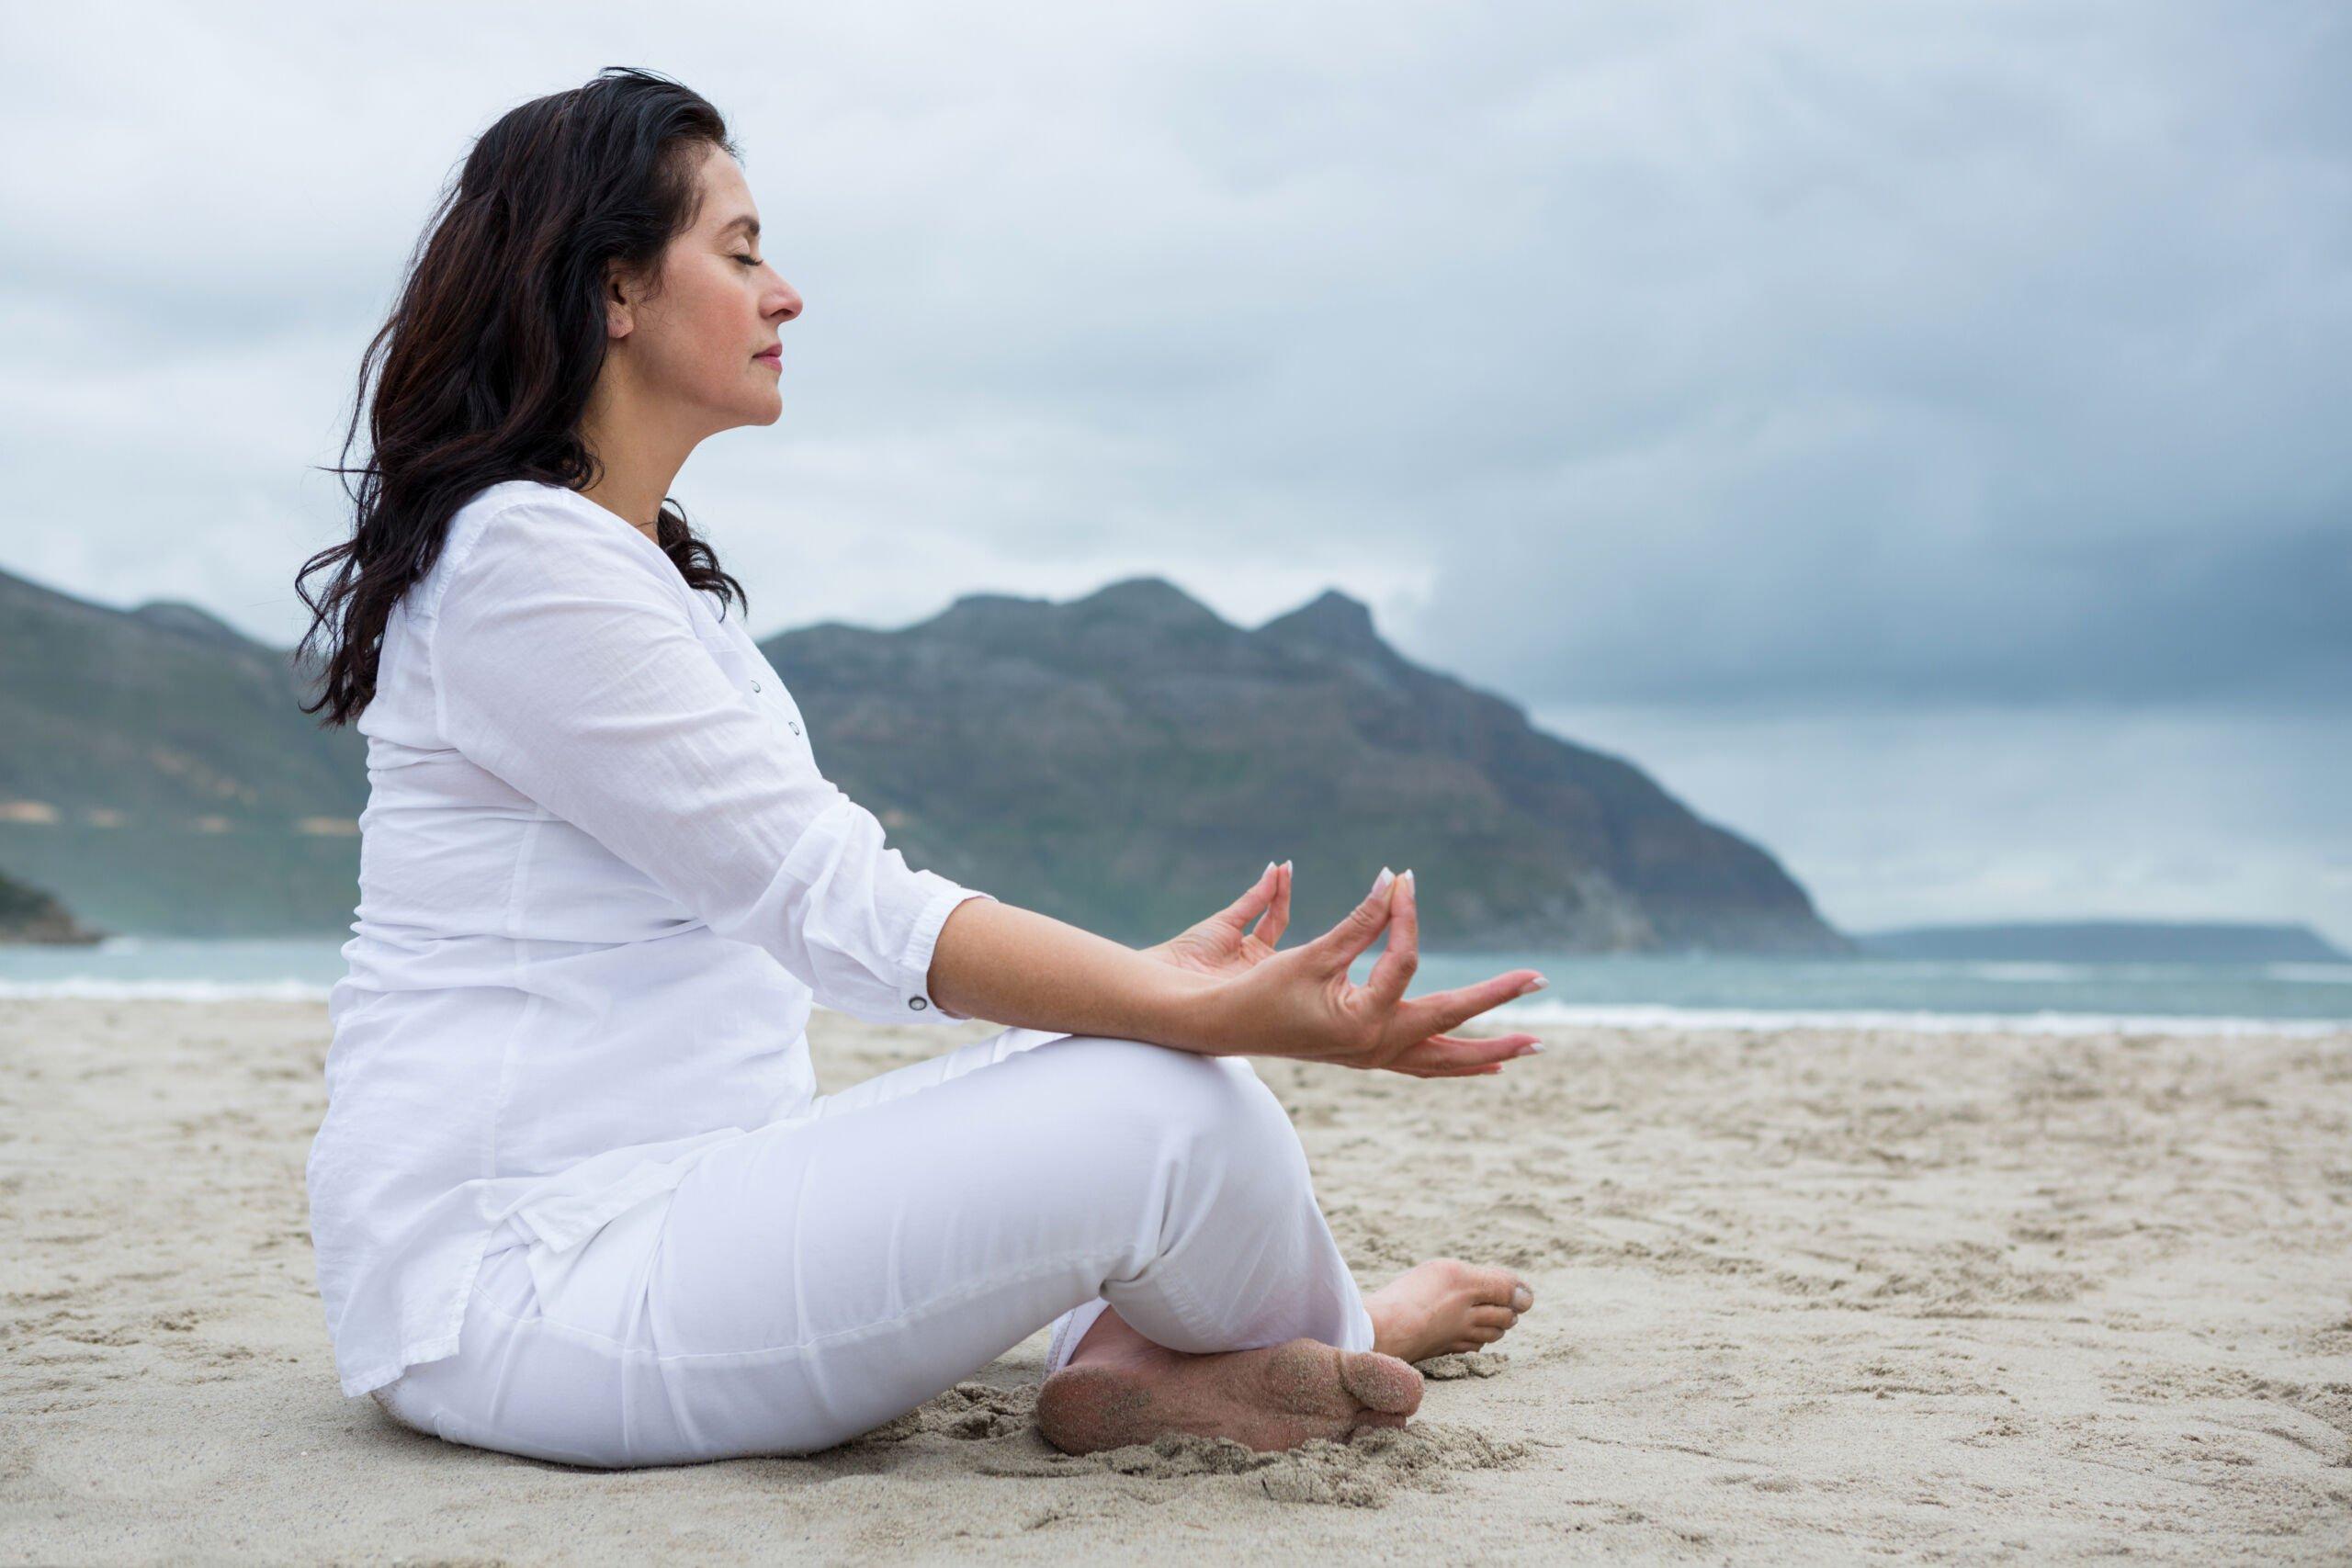 Yoga Teaching As A Career